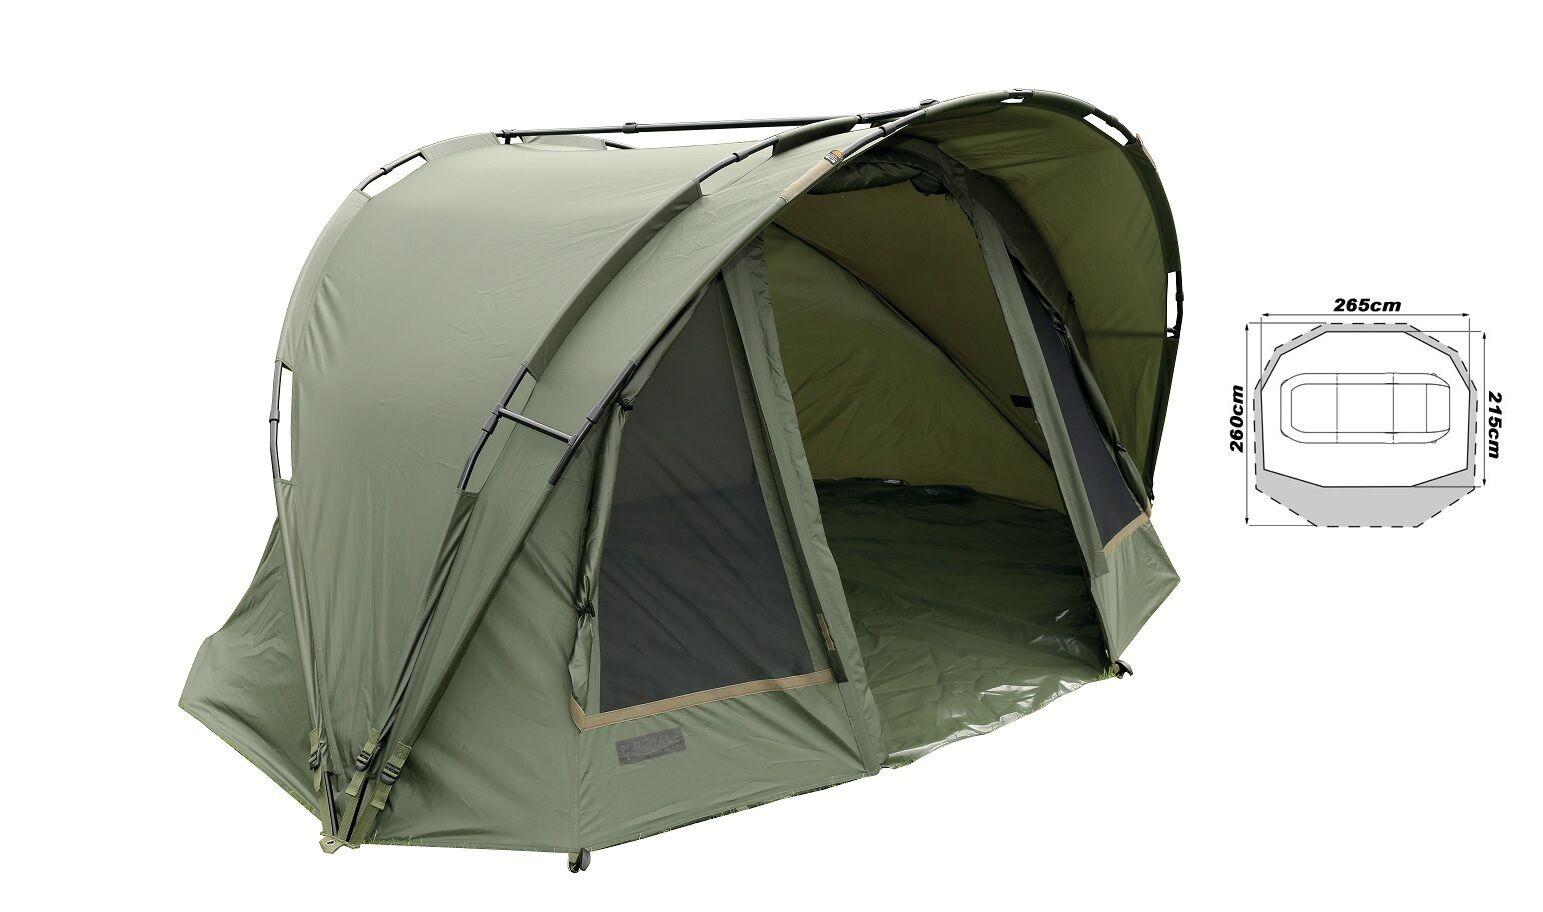 Fox Royale Classic Bivvy  1 Mann CUM148 Karpfenzelt Angelzelt Tent Bivvie Zelt  world famous sale online